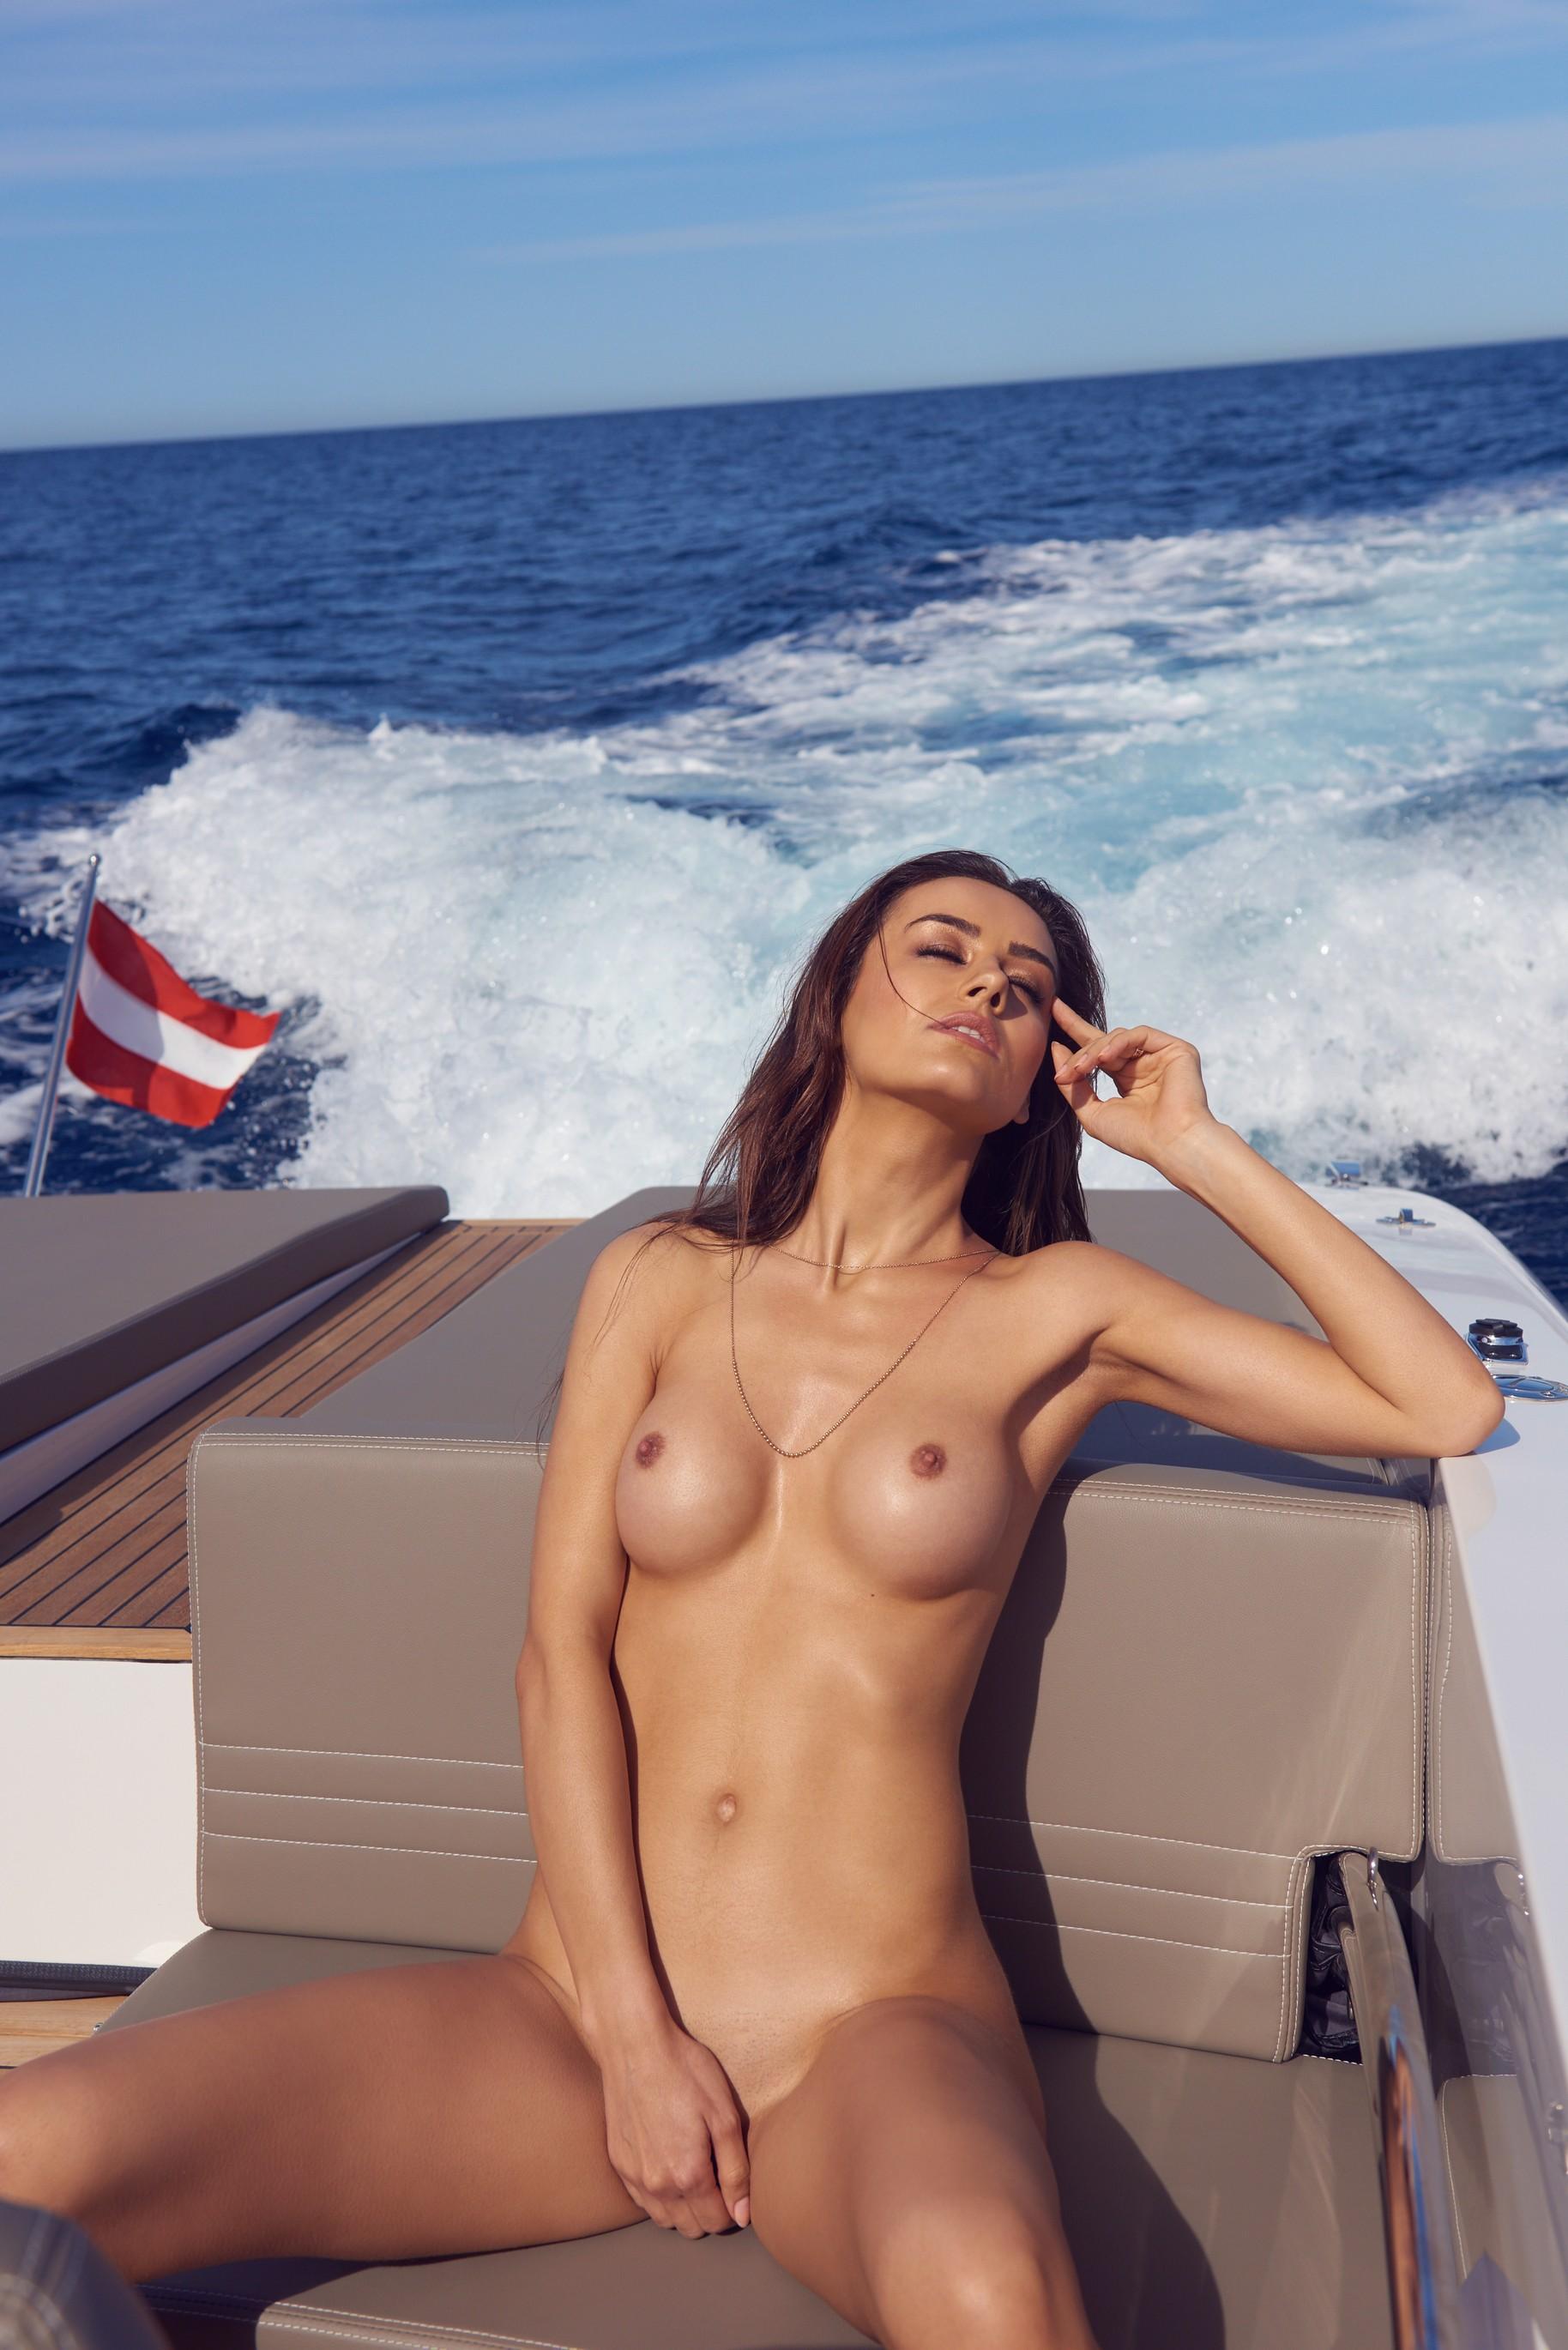 veronika-klimovits-naked-diving-motorboat-seaside-playboy-08